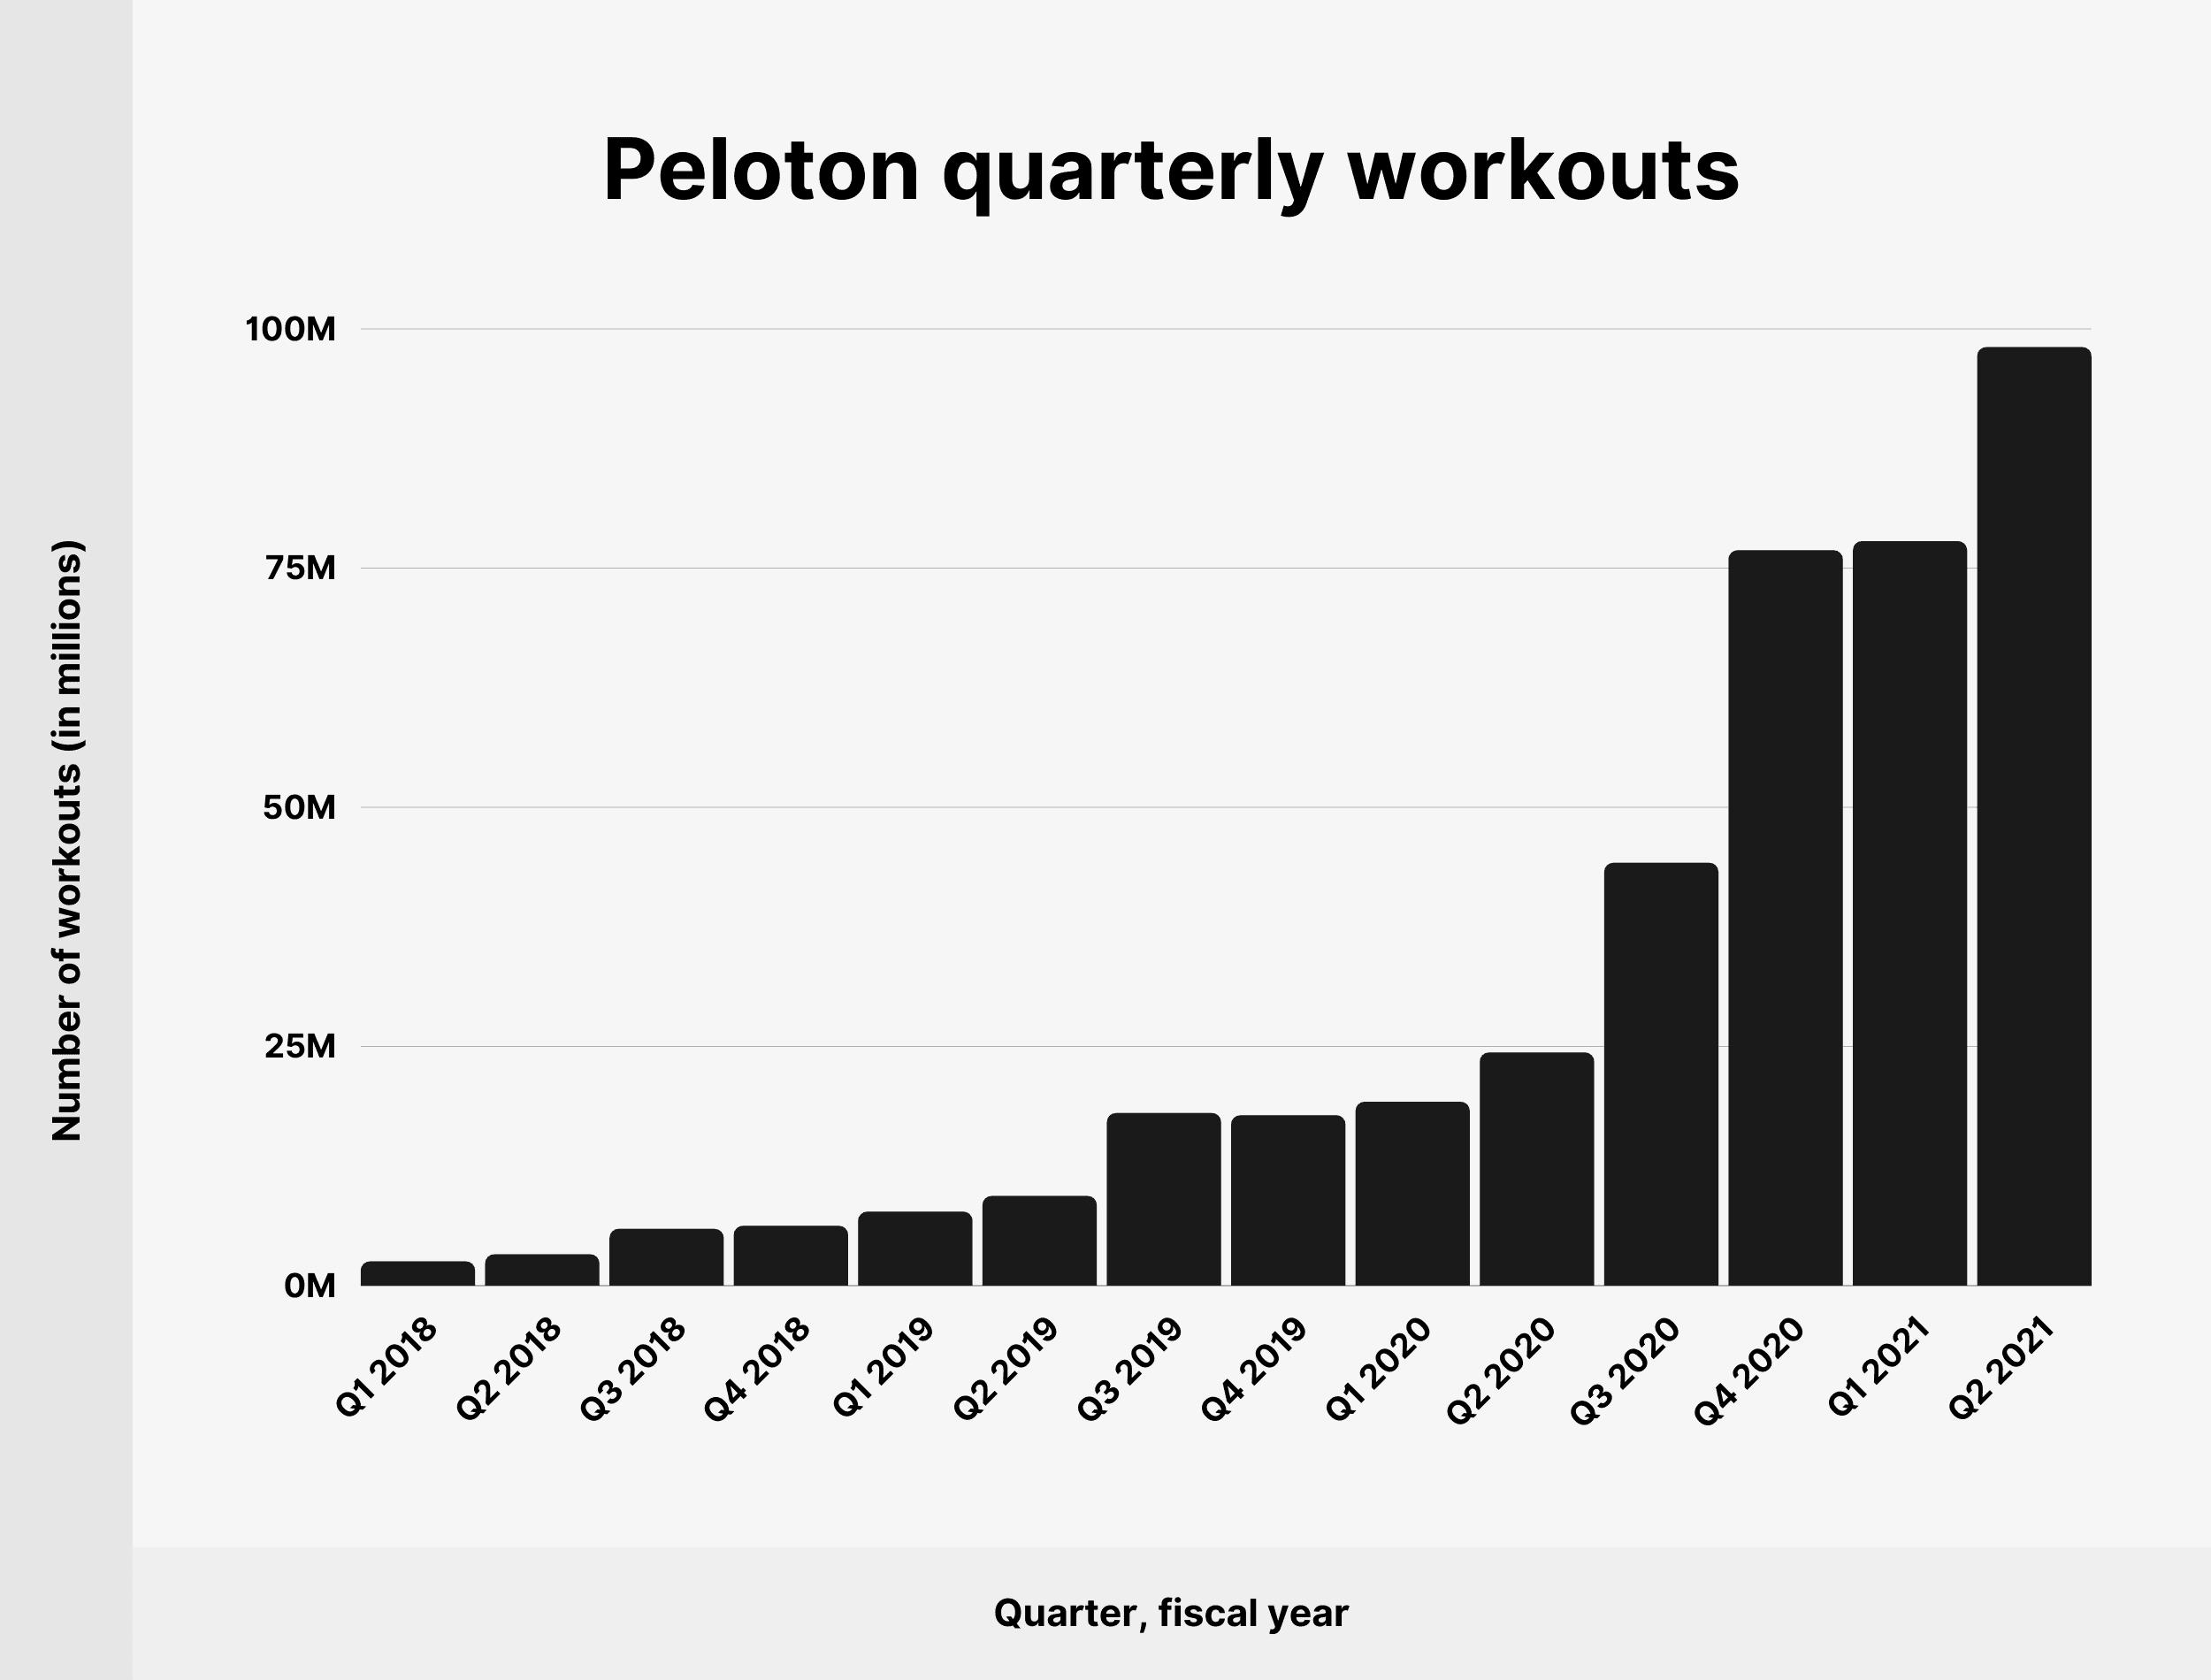 Peloton quarterly workouts